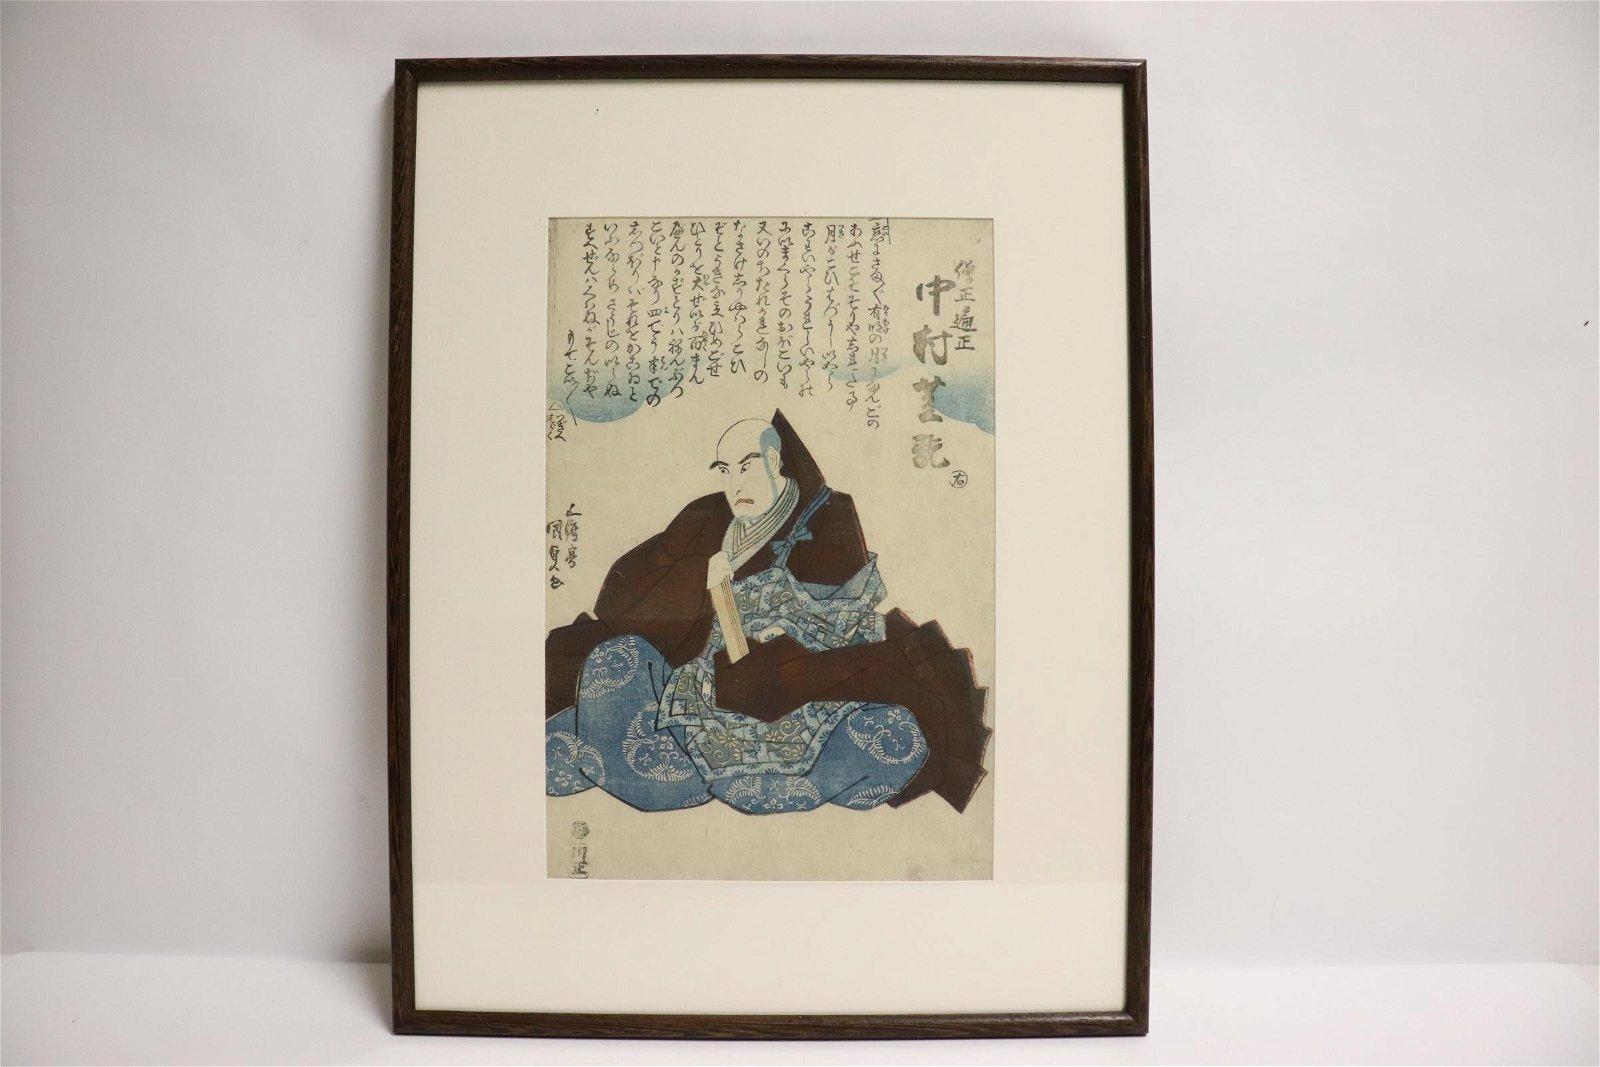 Framed vintage Japanese w/b print by kunisada